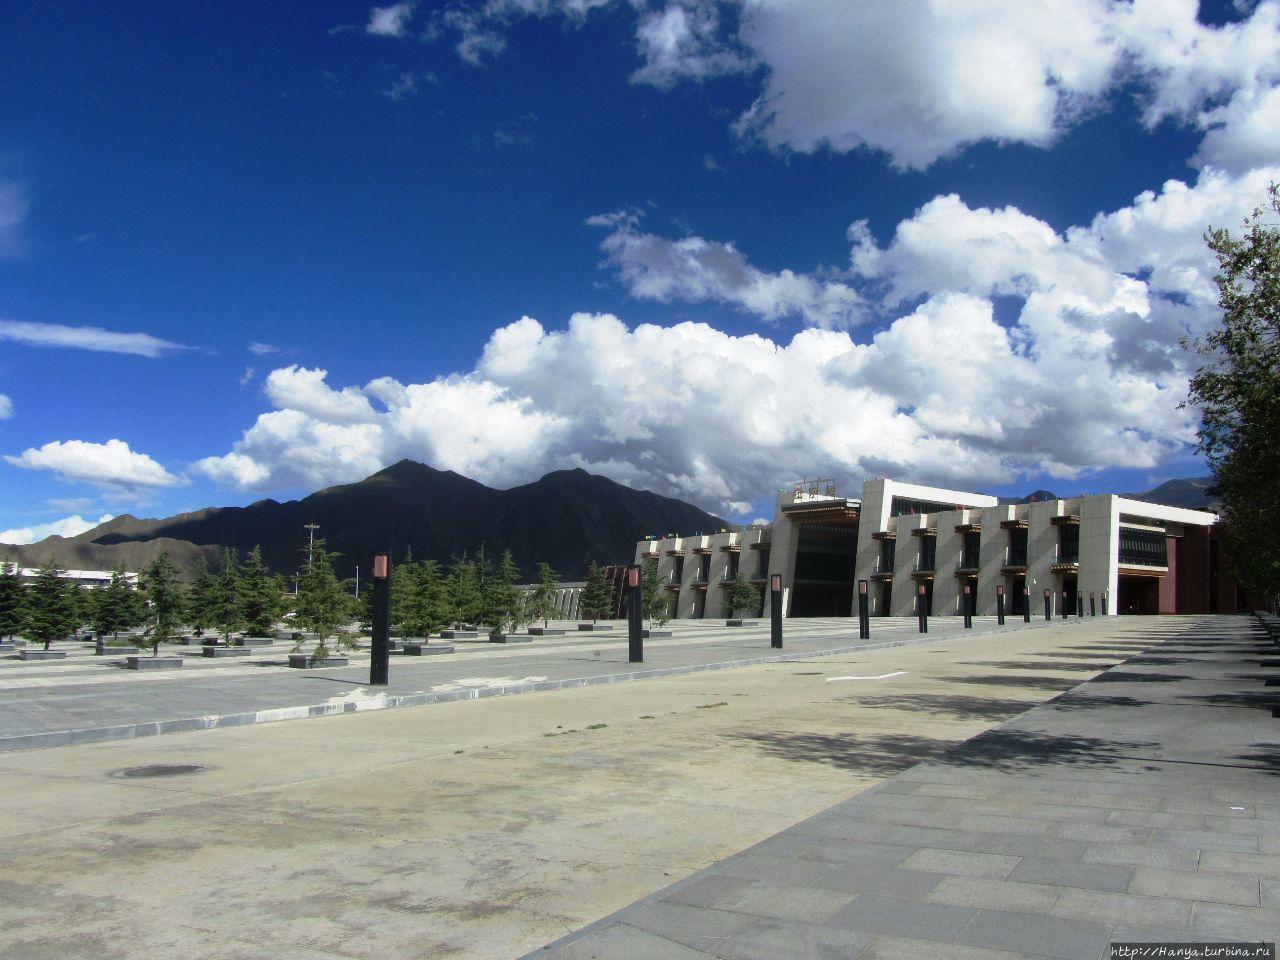 Вокзал Лхасы